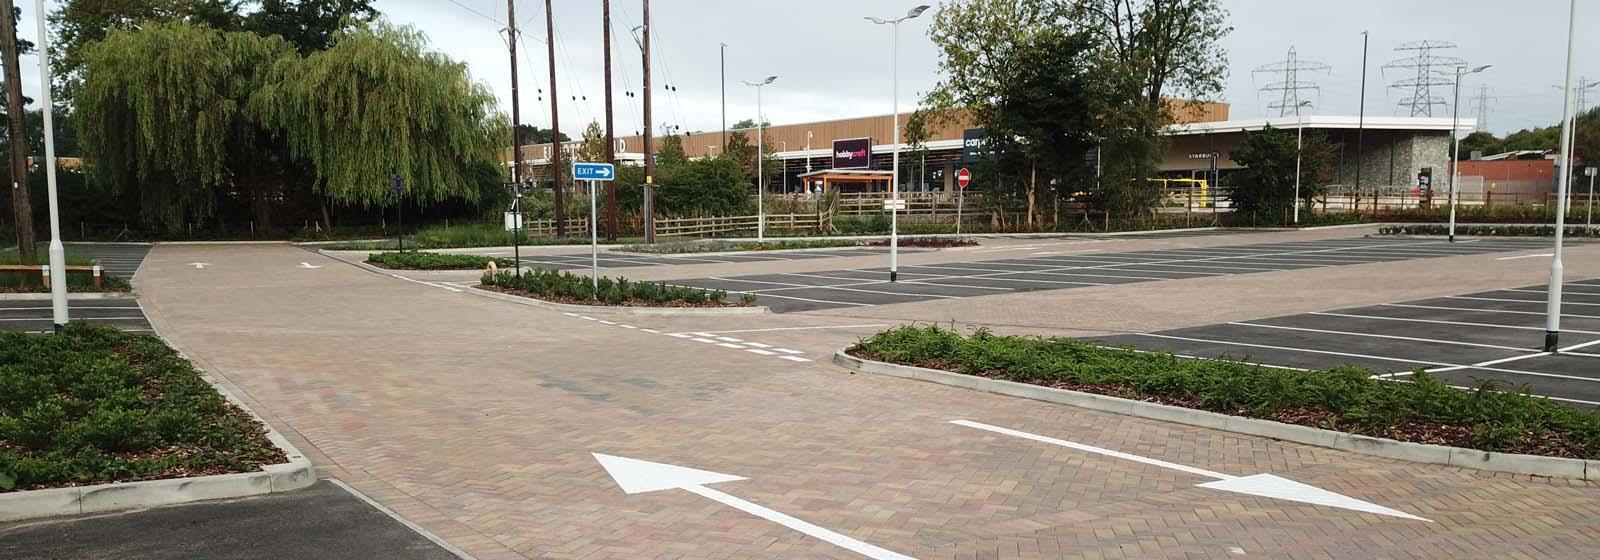 Elliott's Field Retail Park – Car Park